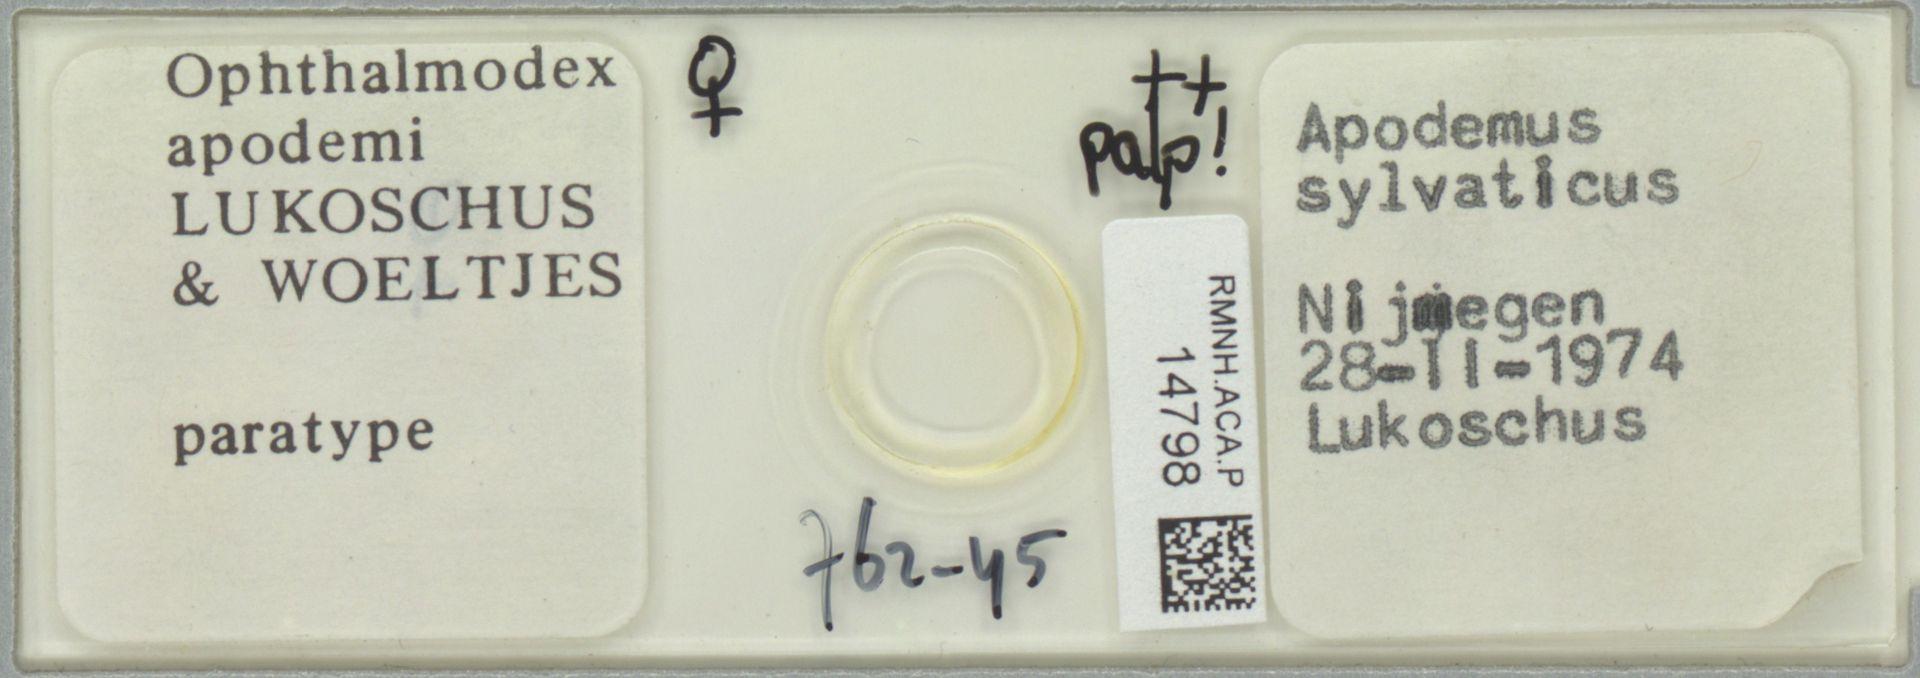 RMNH.ACA.P.14798 | Ophthalmodex apodemi